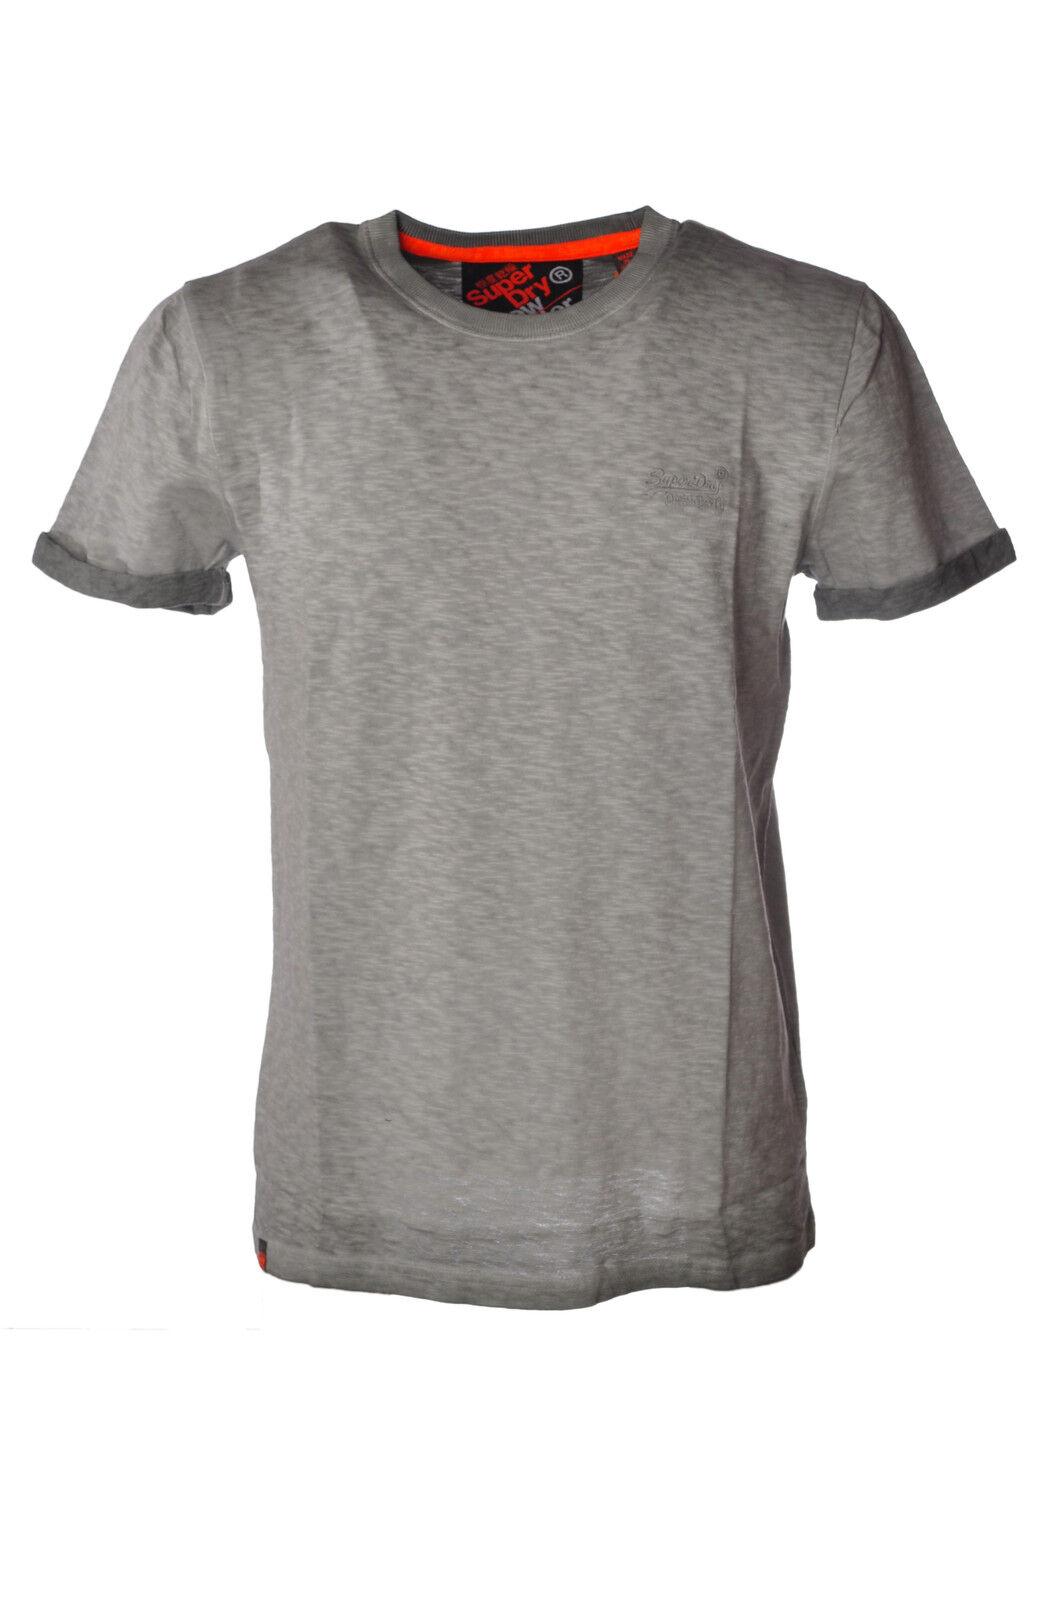 Superdry - Topwear-T-shirts - Mann - Grau - 3478814H184137